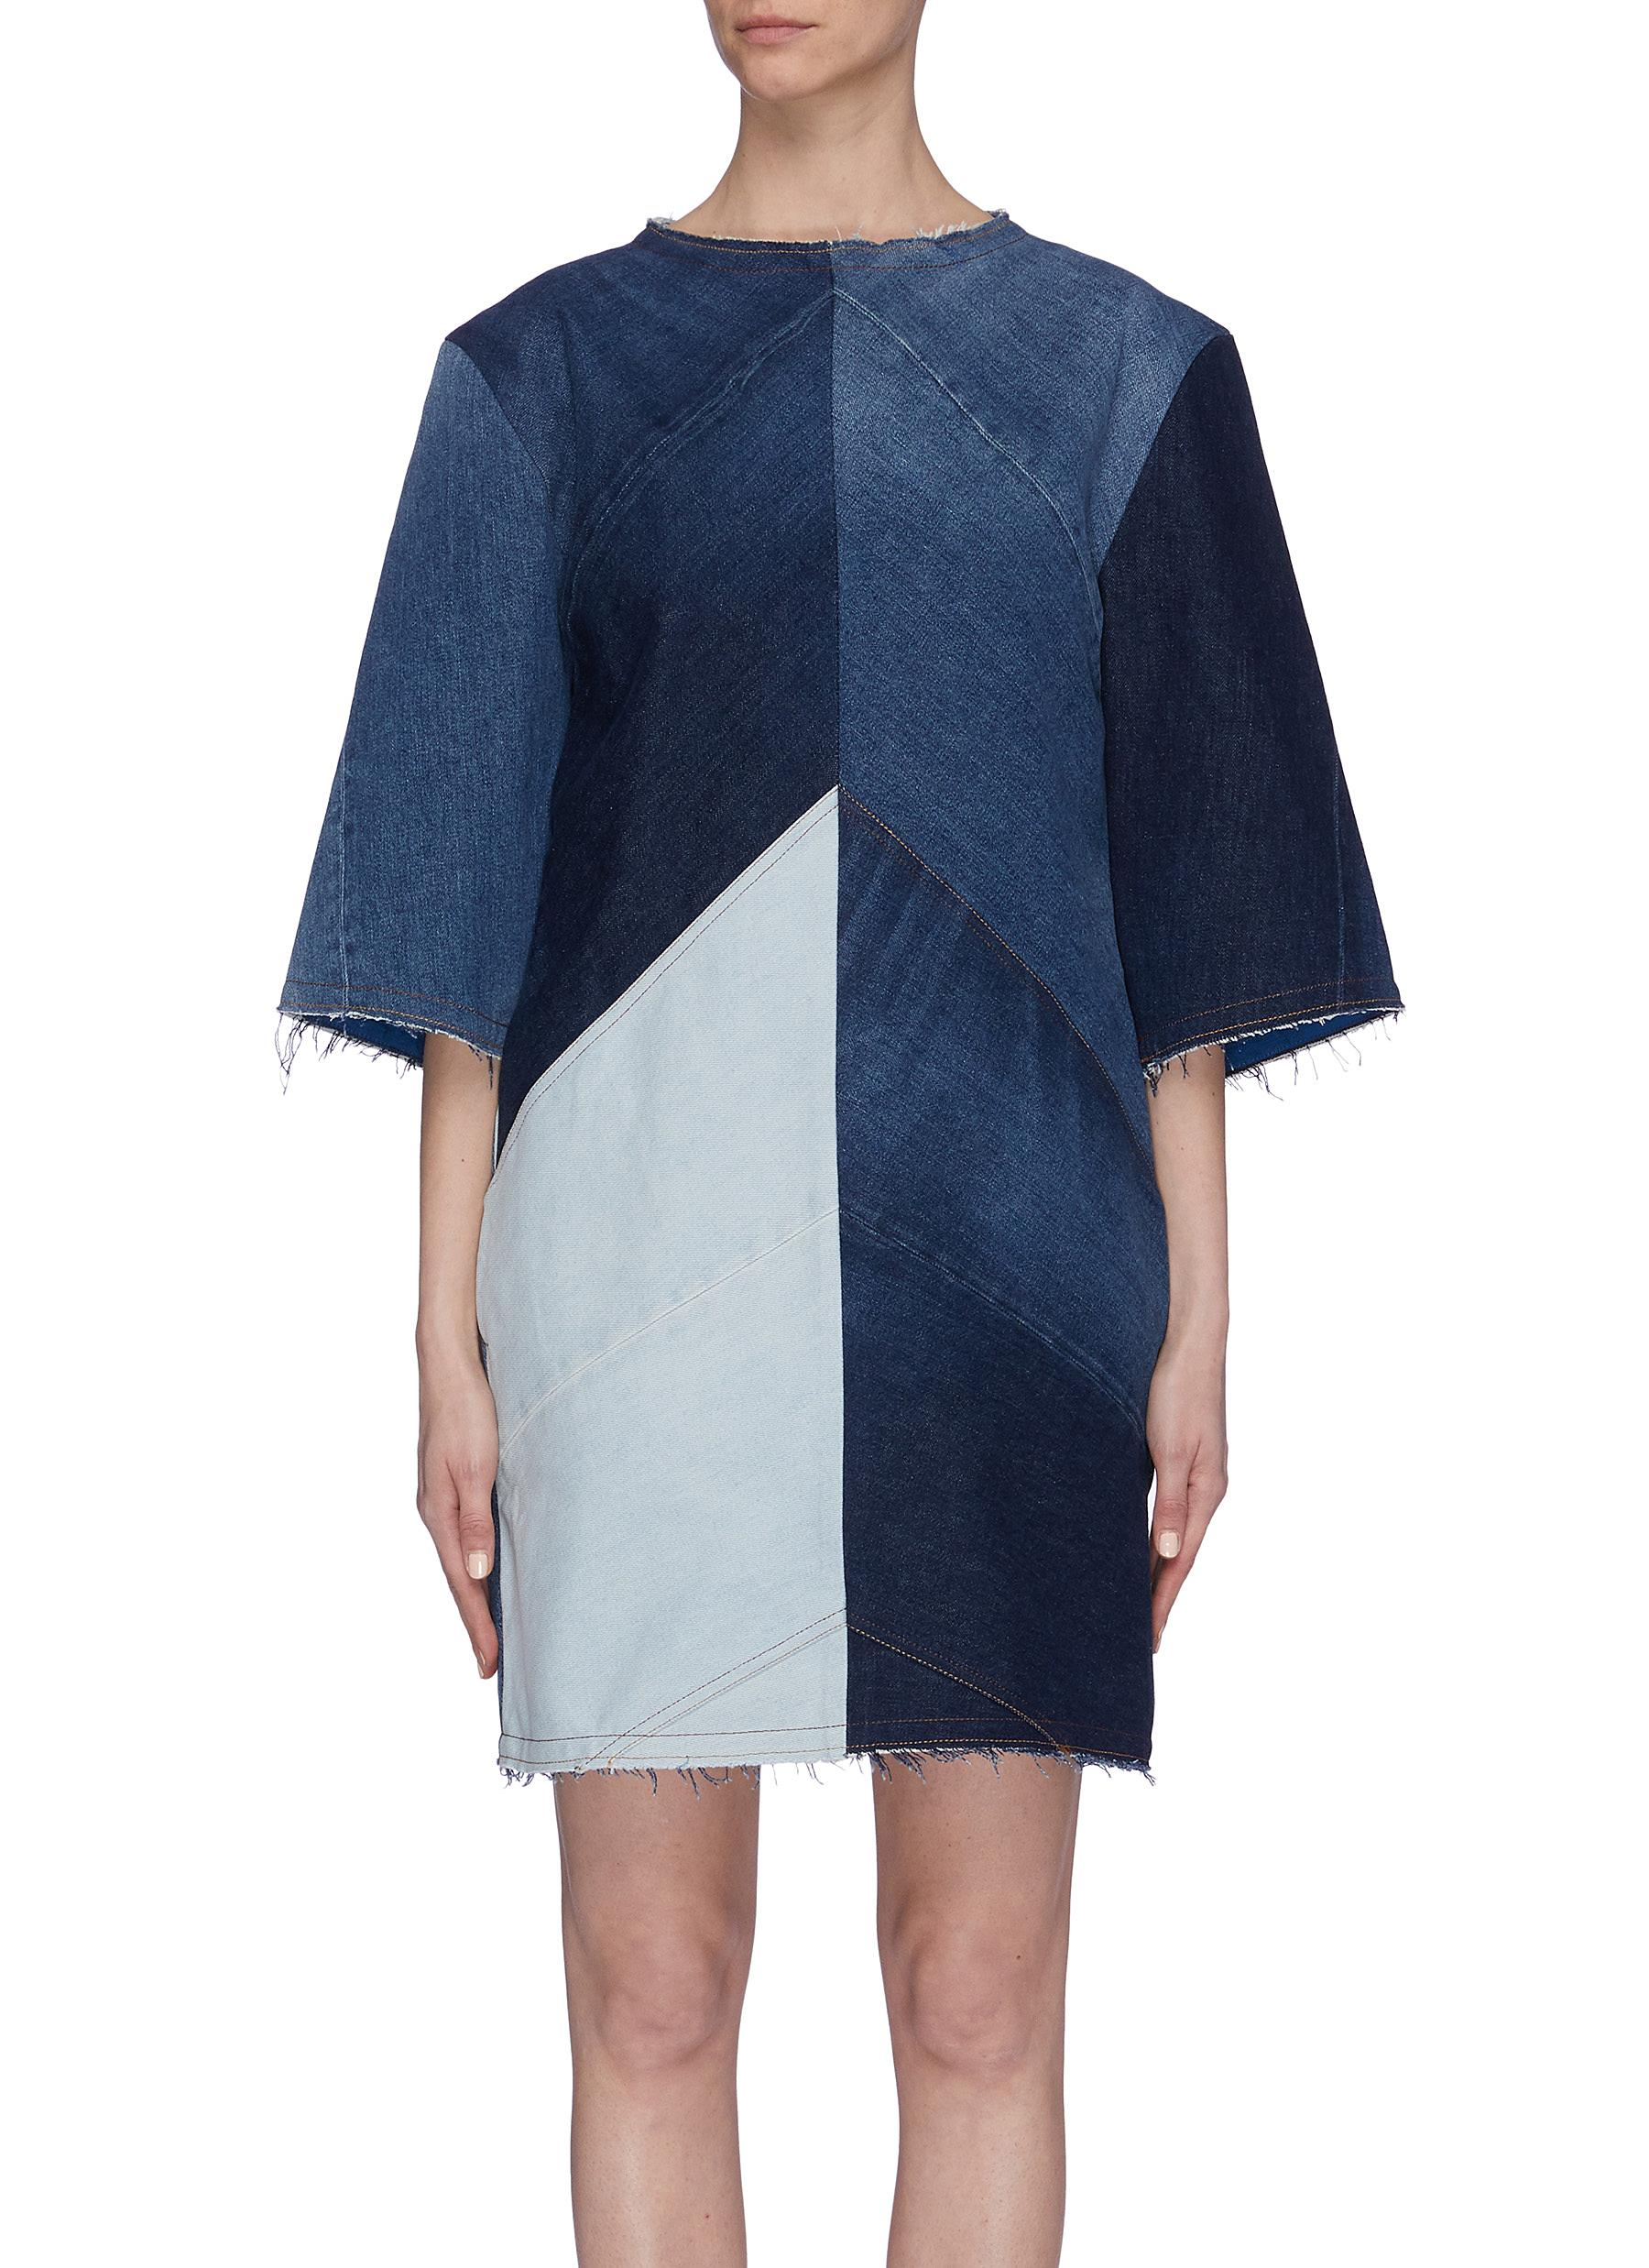 Buy Acne Studios Dresses Patchwork denim T-shirt dress